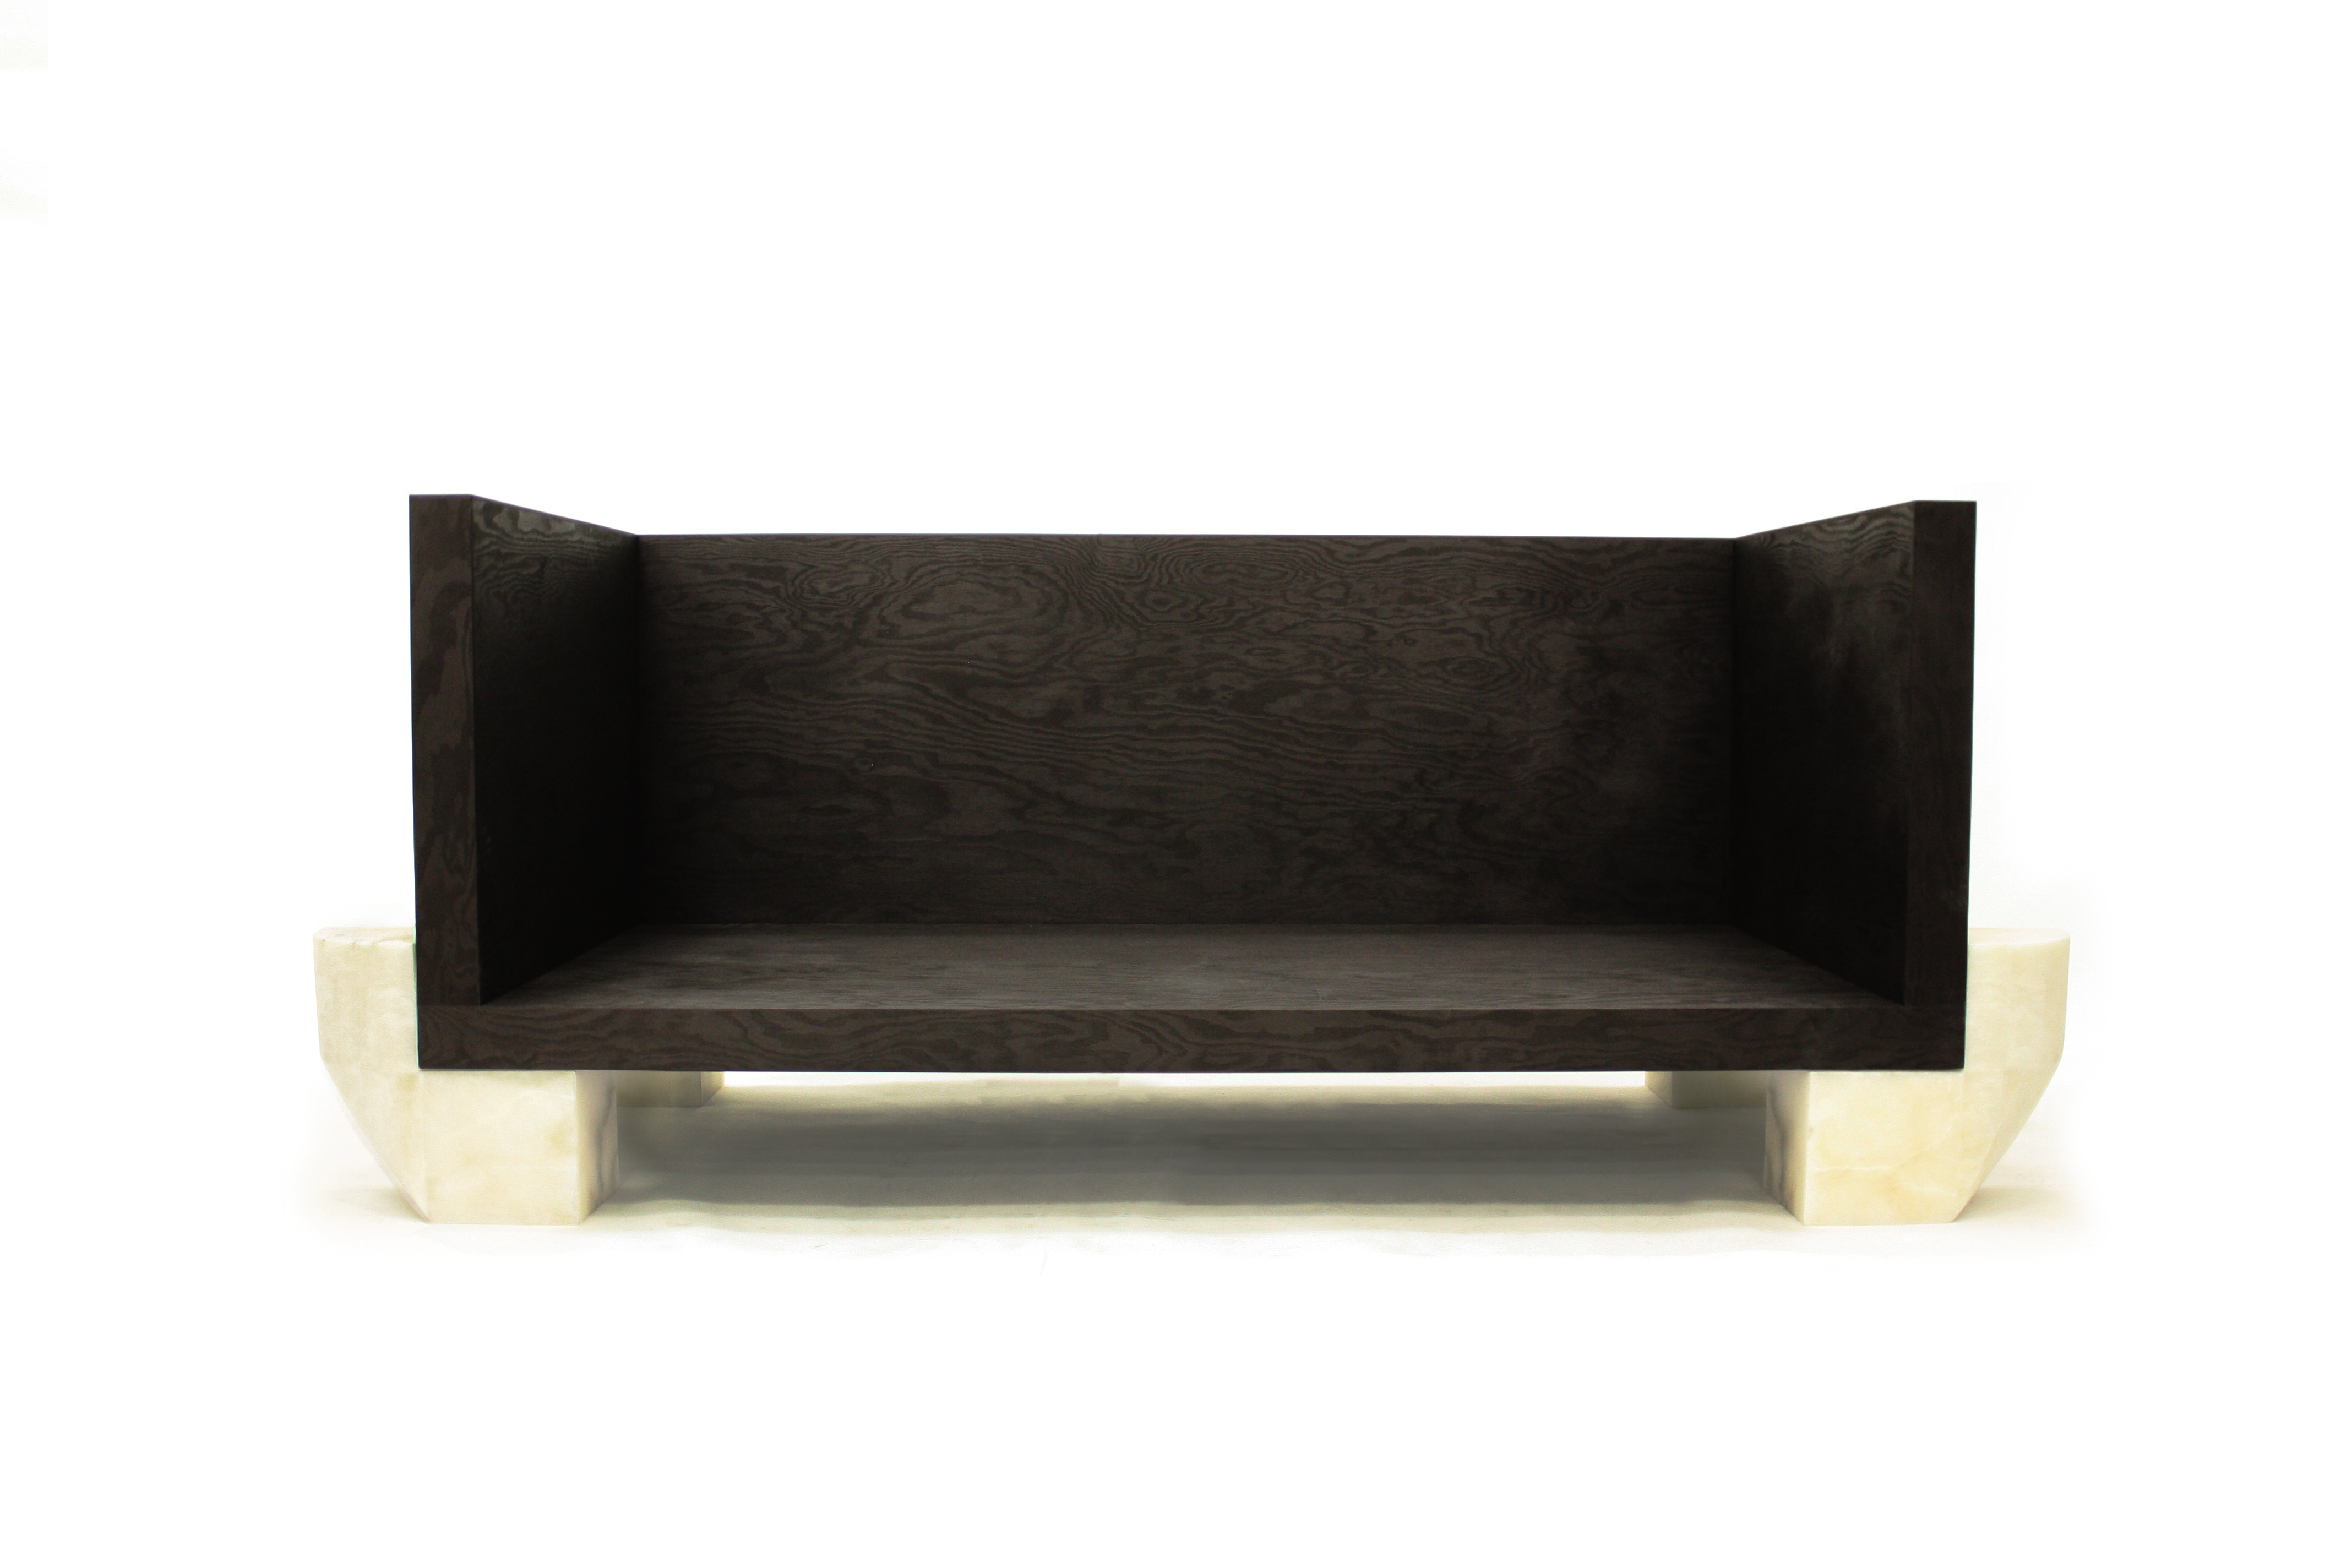 Boudeuse in Alabaster, Black Plywood. Courtesy of Carpenters Workshop Gallery